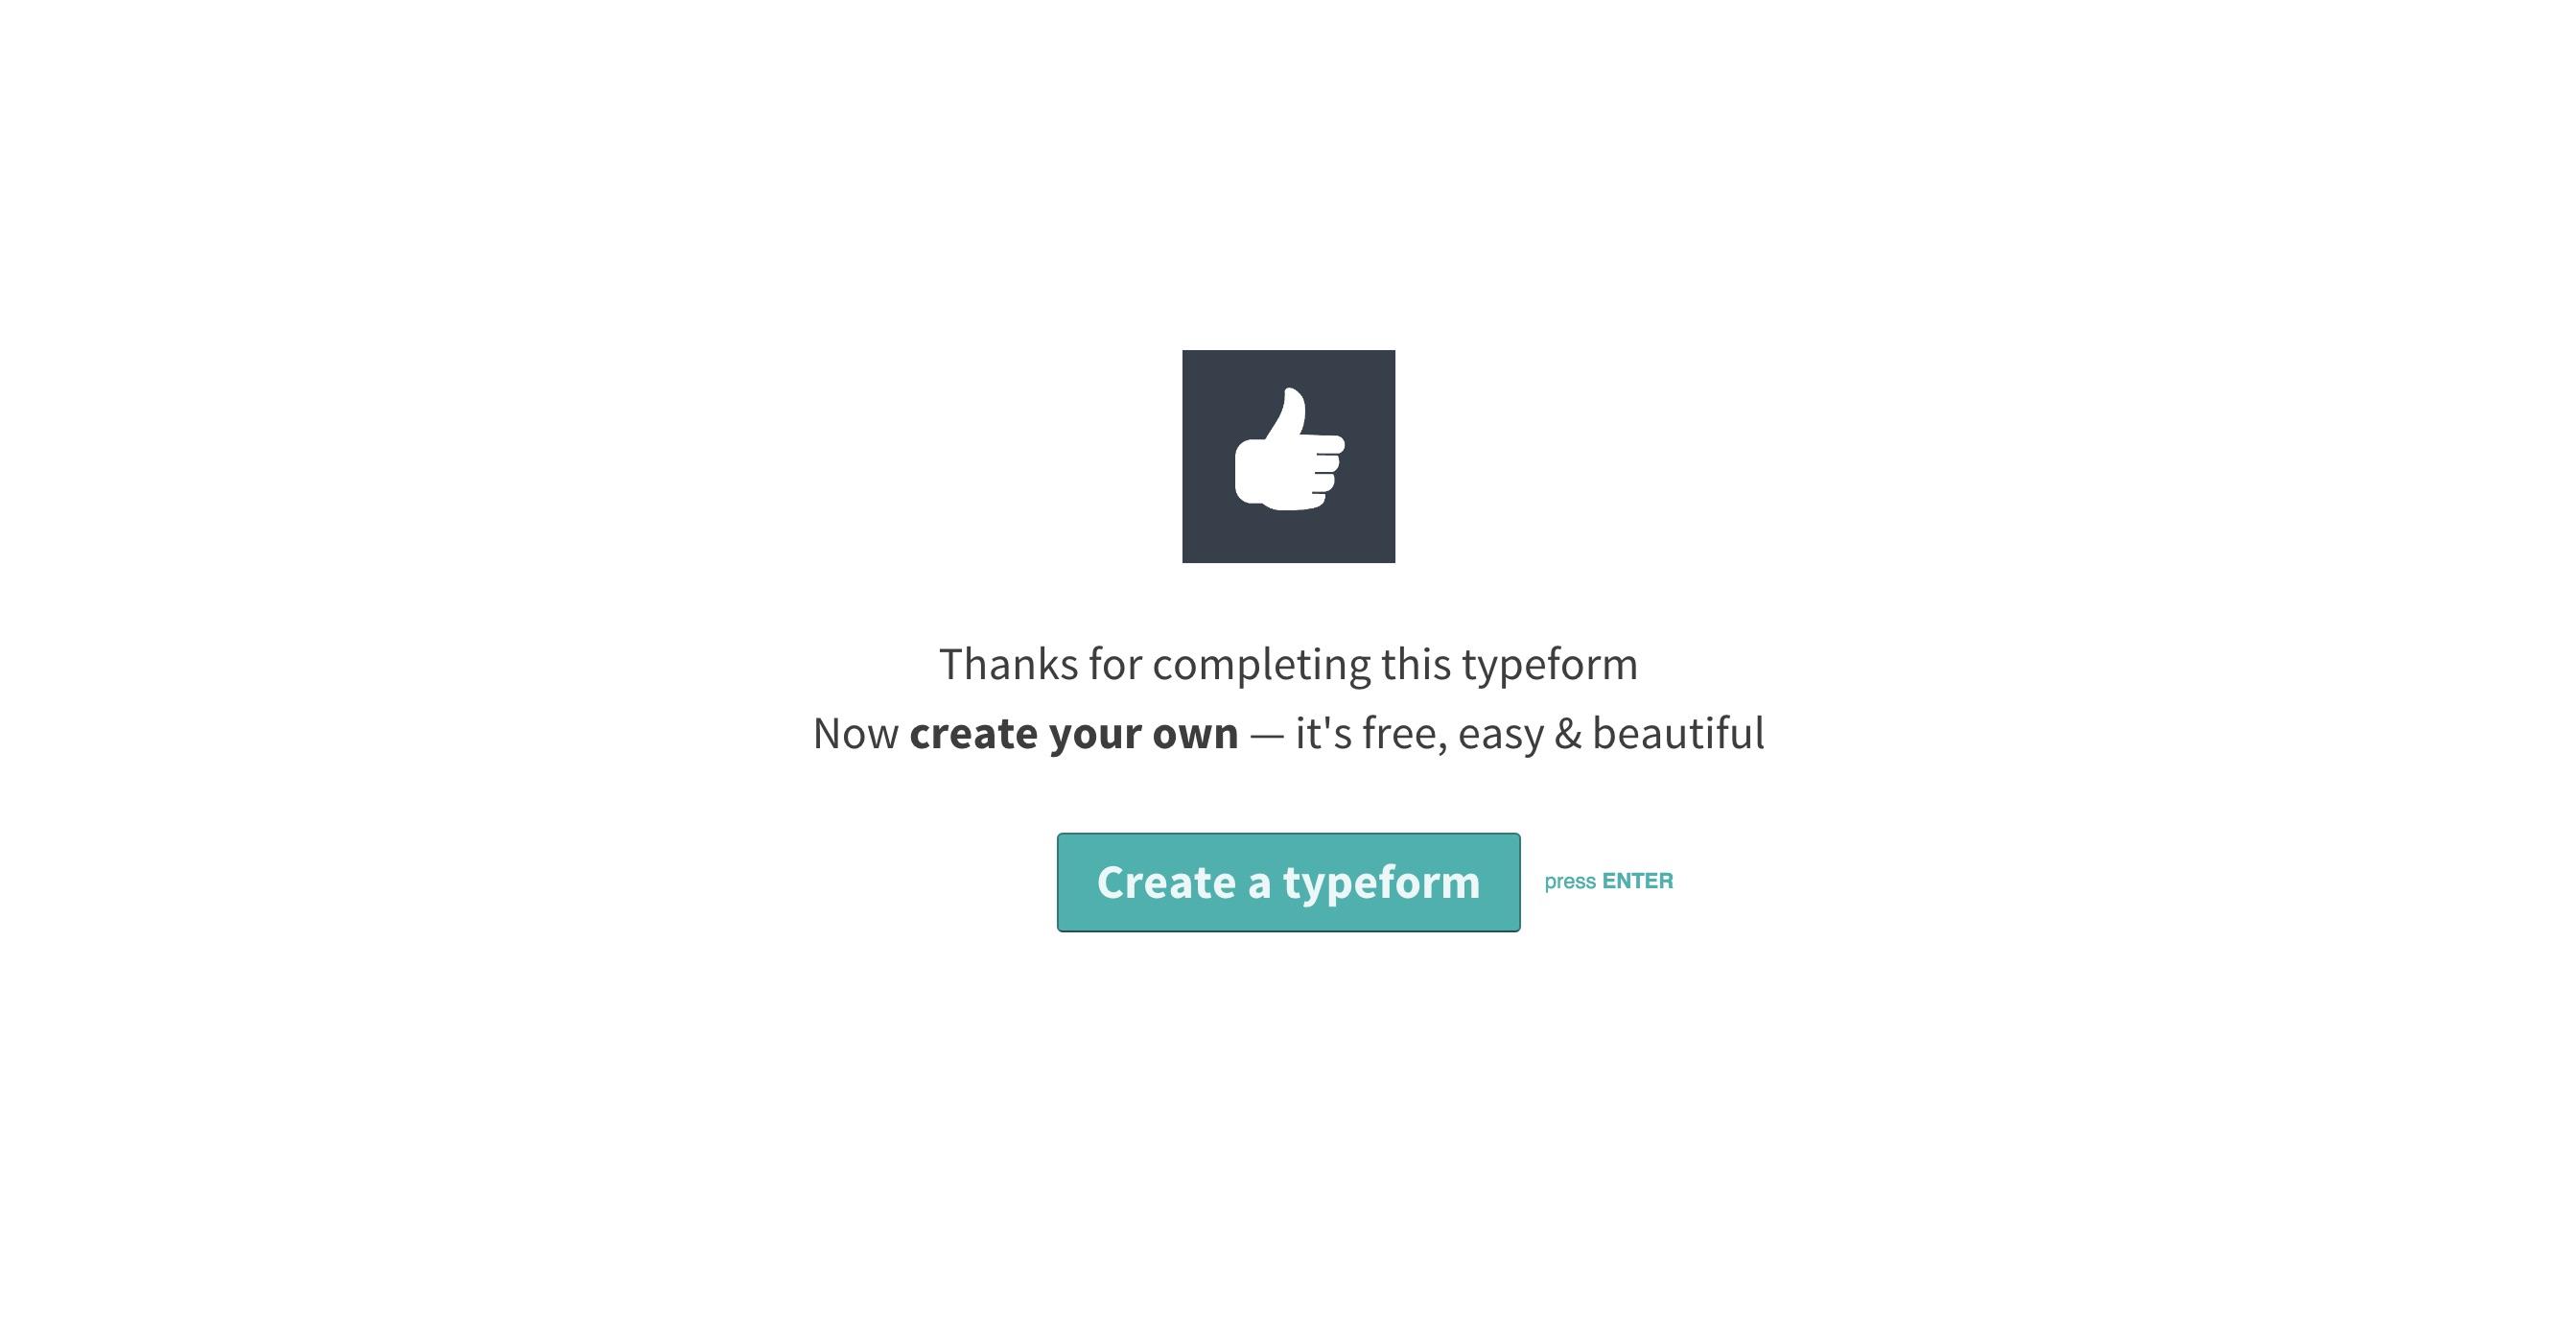 Typeform viral loop cta for freemium accounts